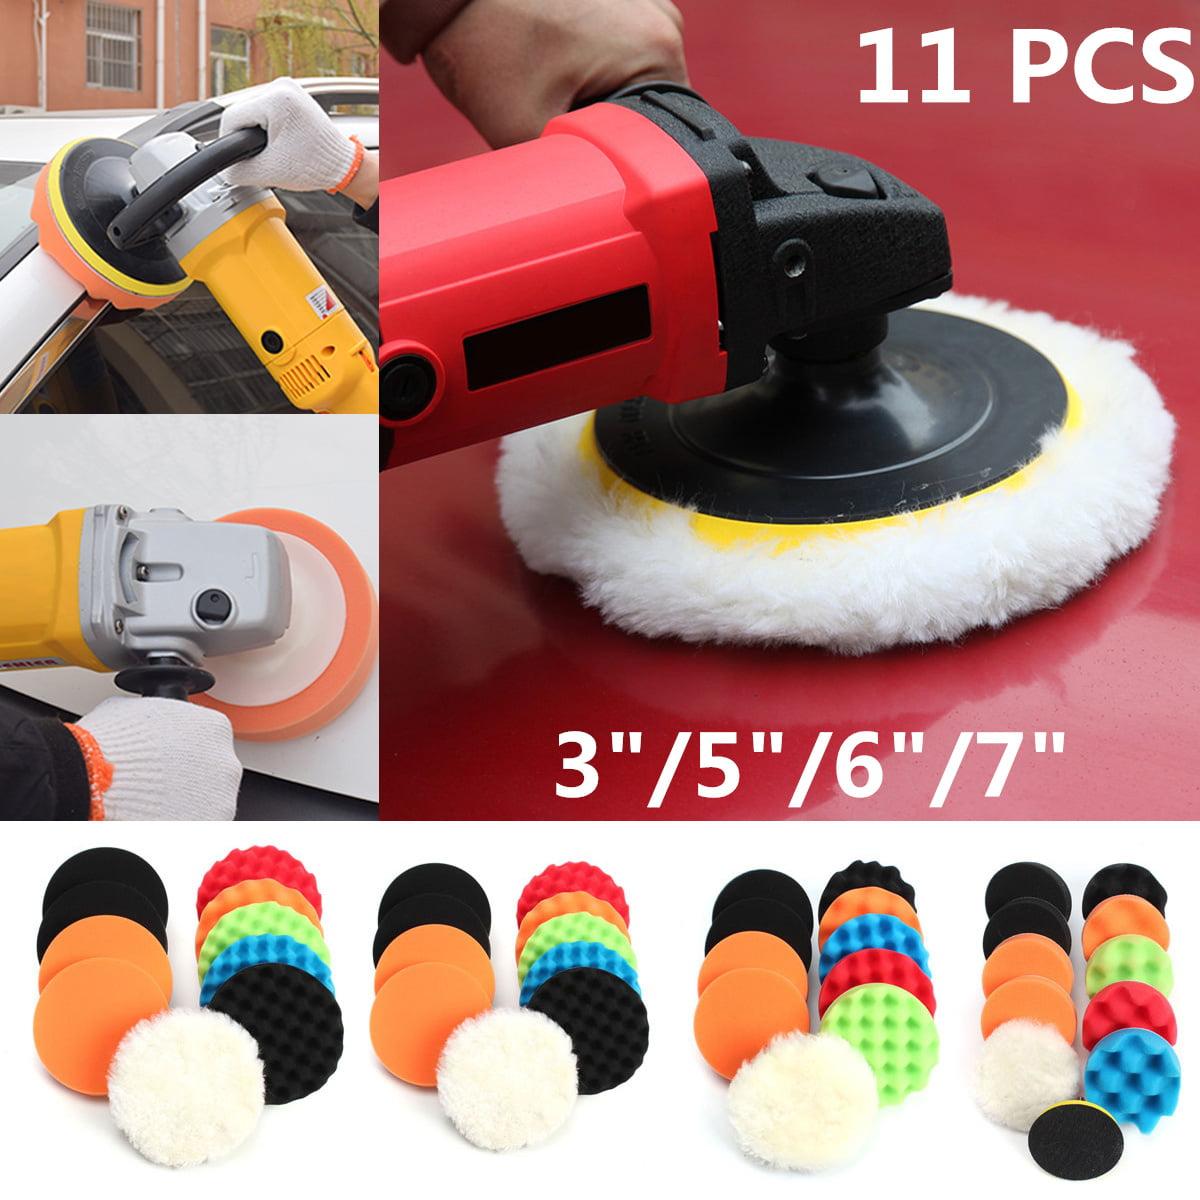 18 PCS 7 Inch Polishing Pad Sponge Buff Buffing Kit Set Car Polisher for Drill